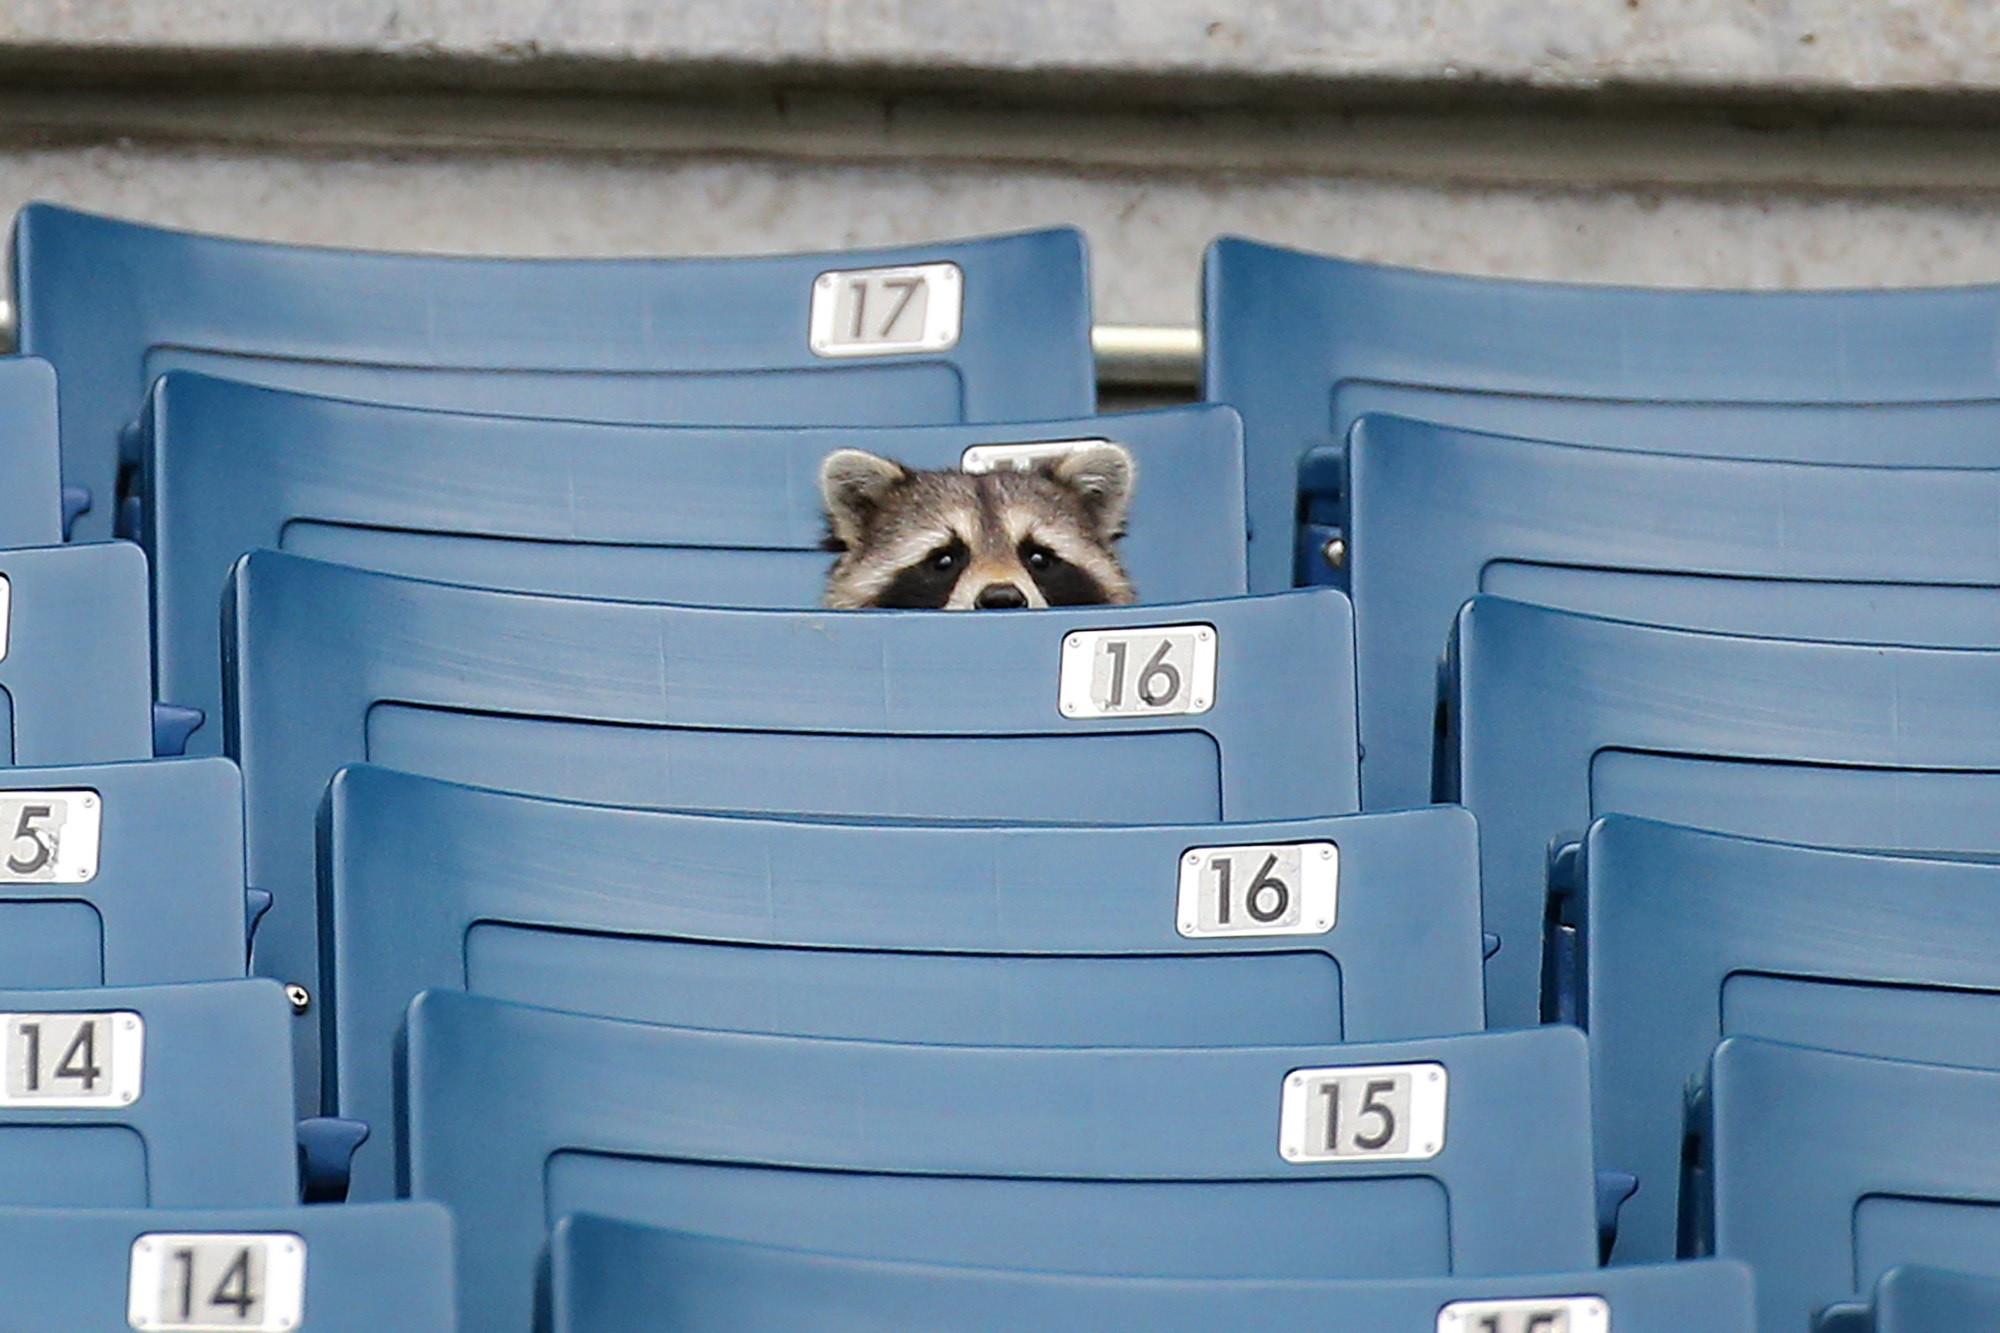 Raccoon watching a baseball game